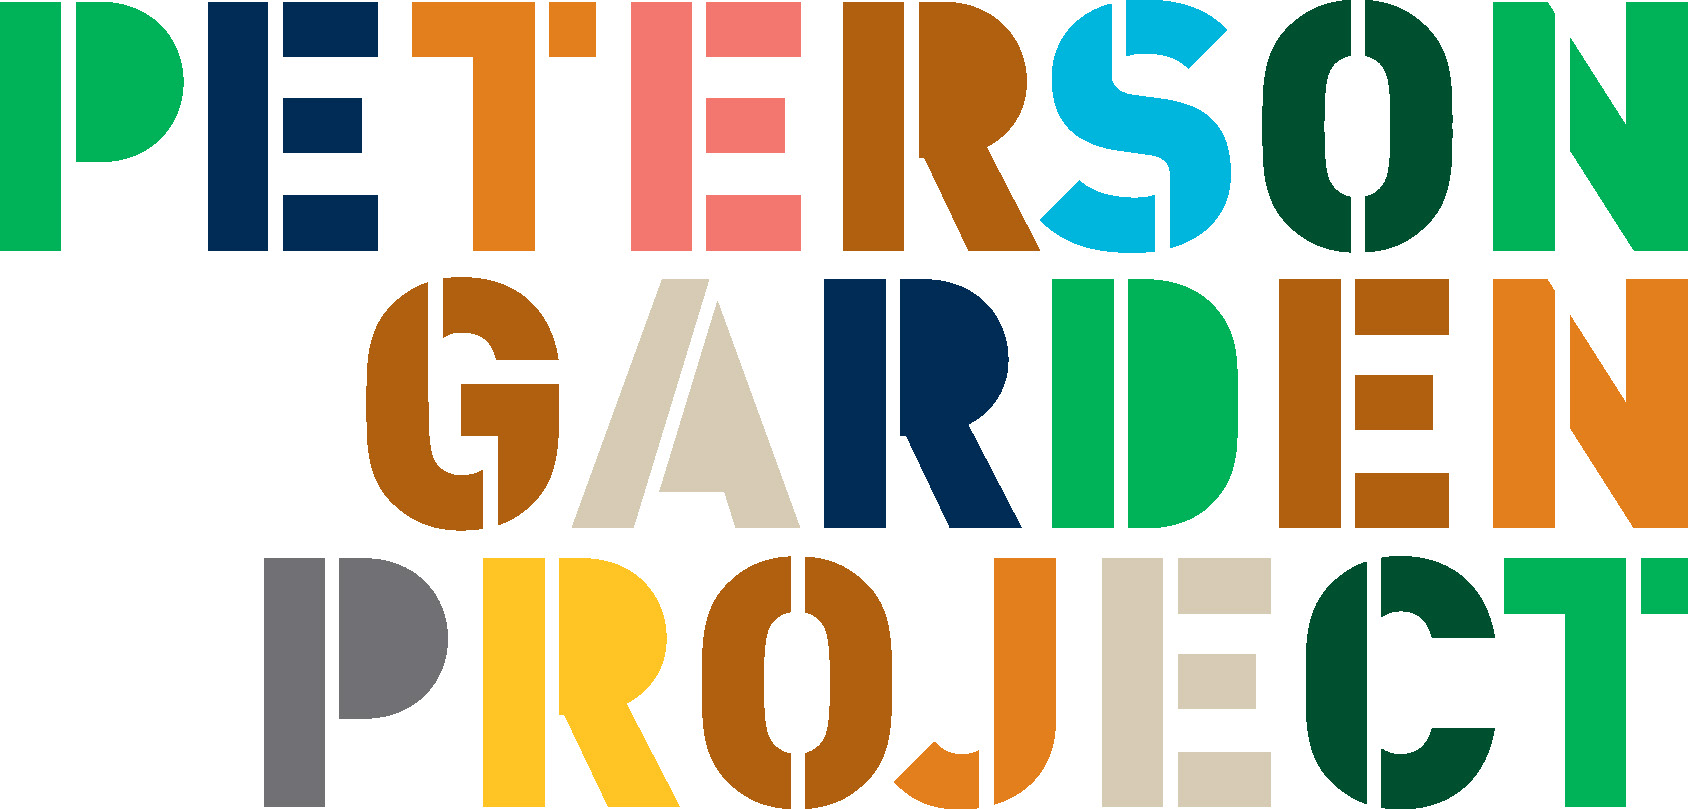 Peterson Garden Project